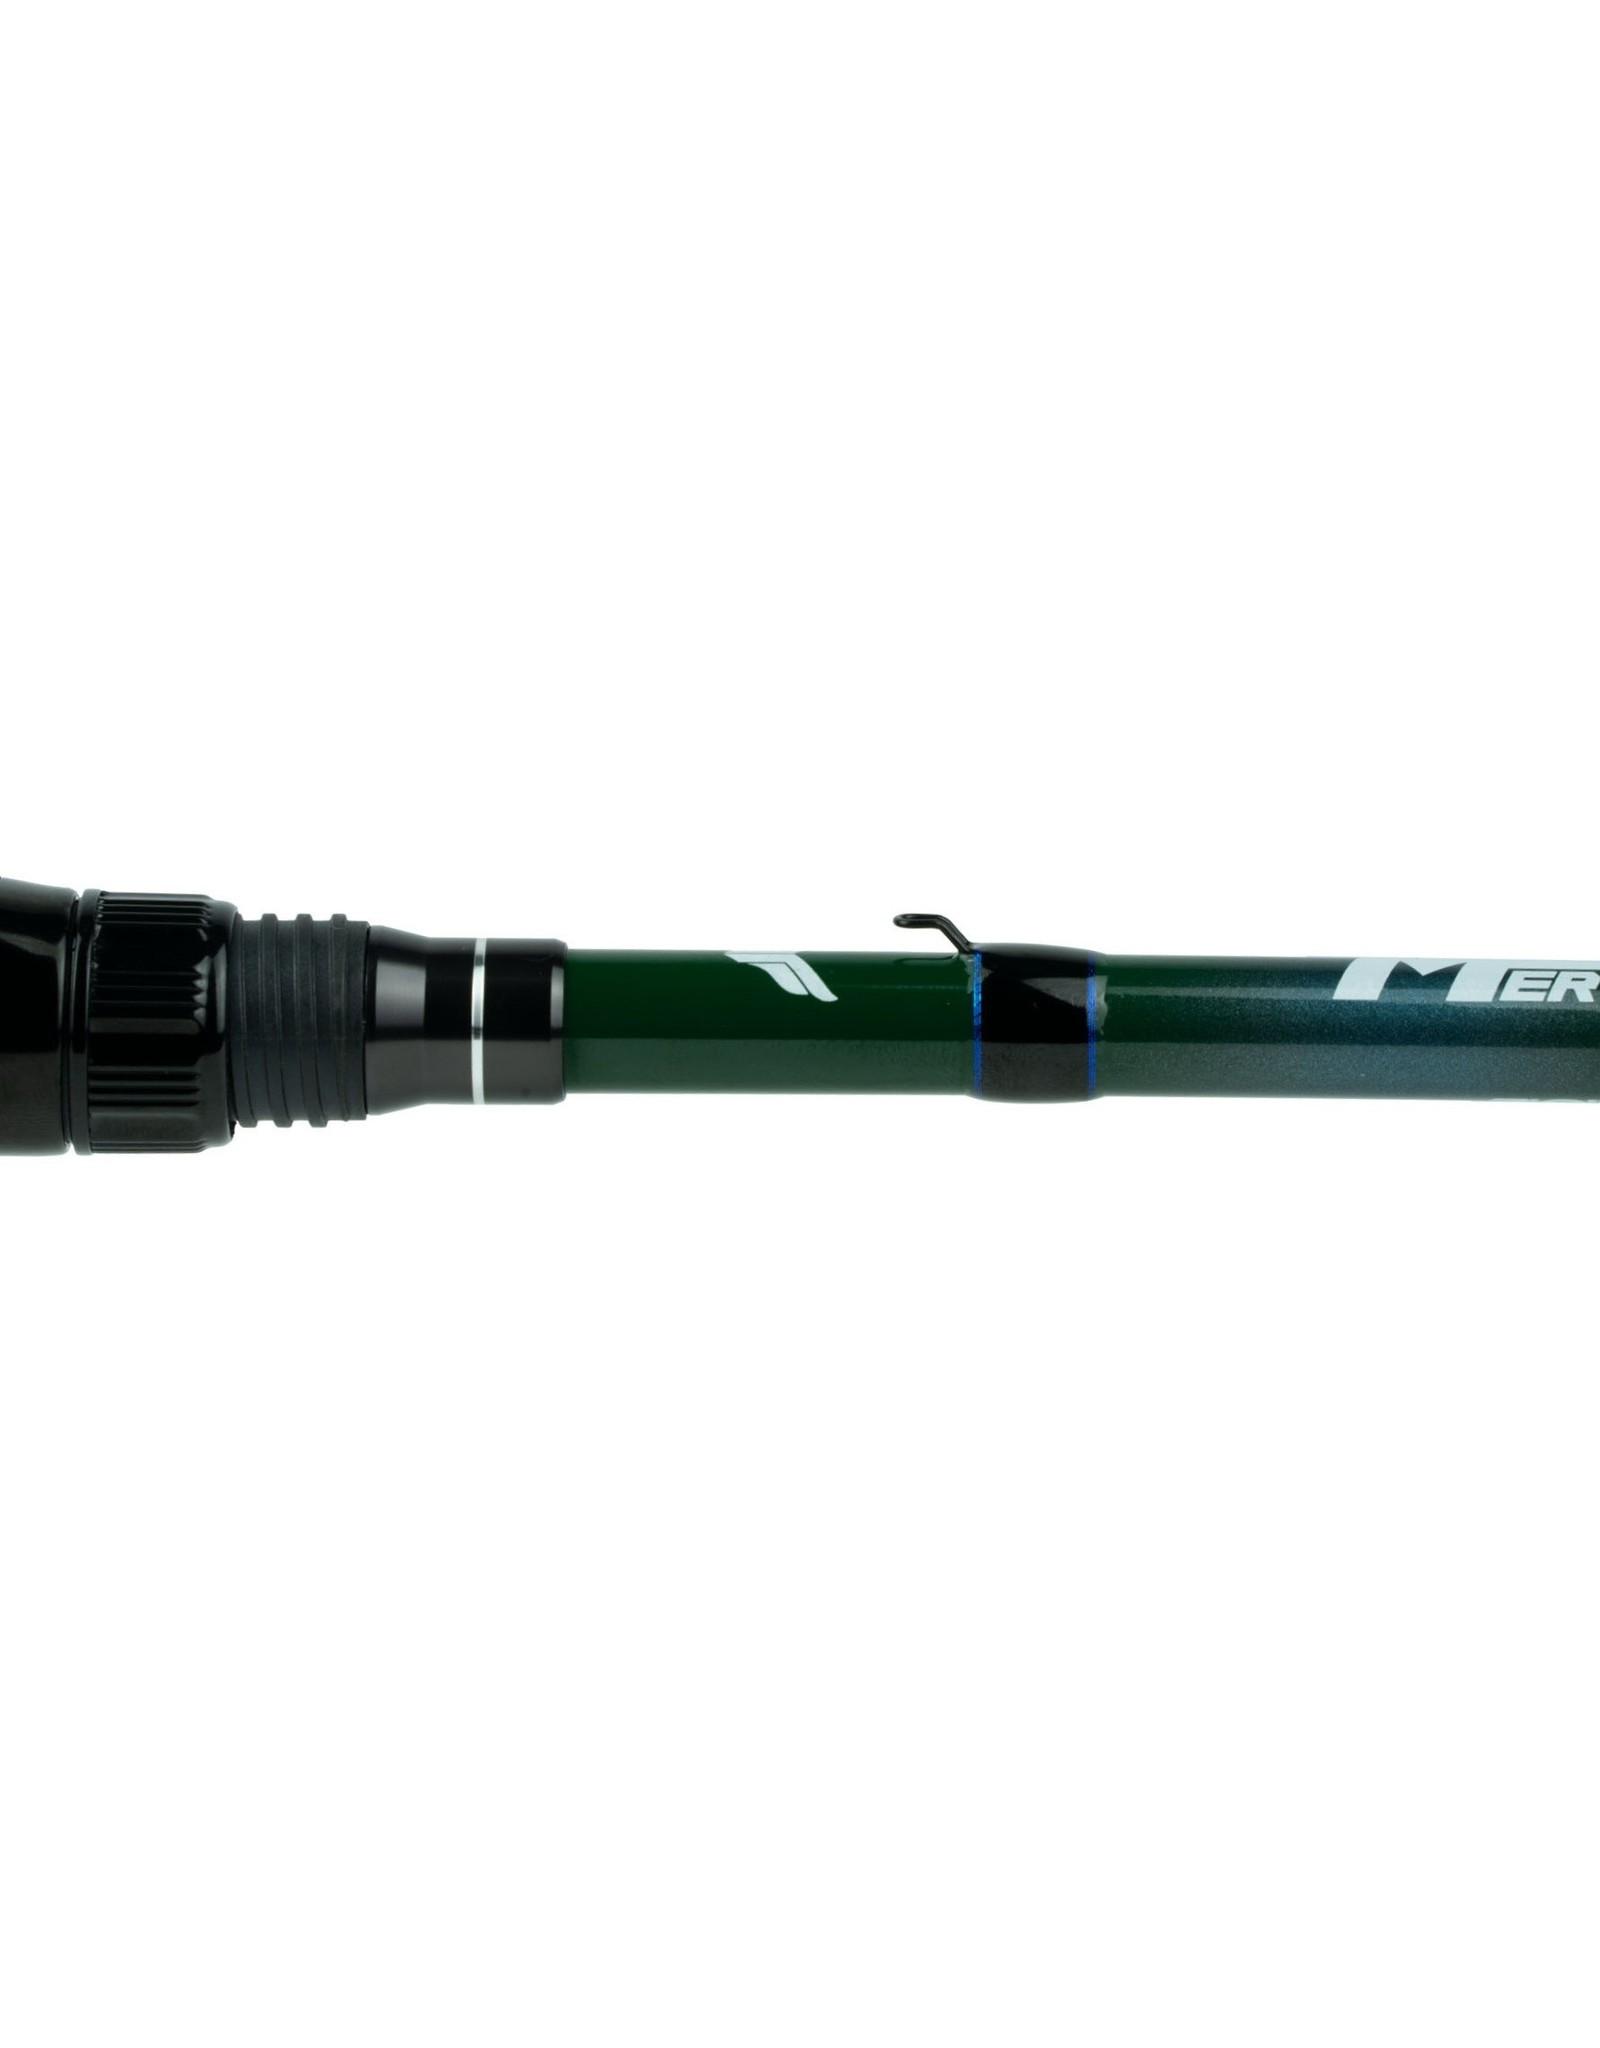 6th Sense Fishing 6th Sense Milliken Series Casting Rods